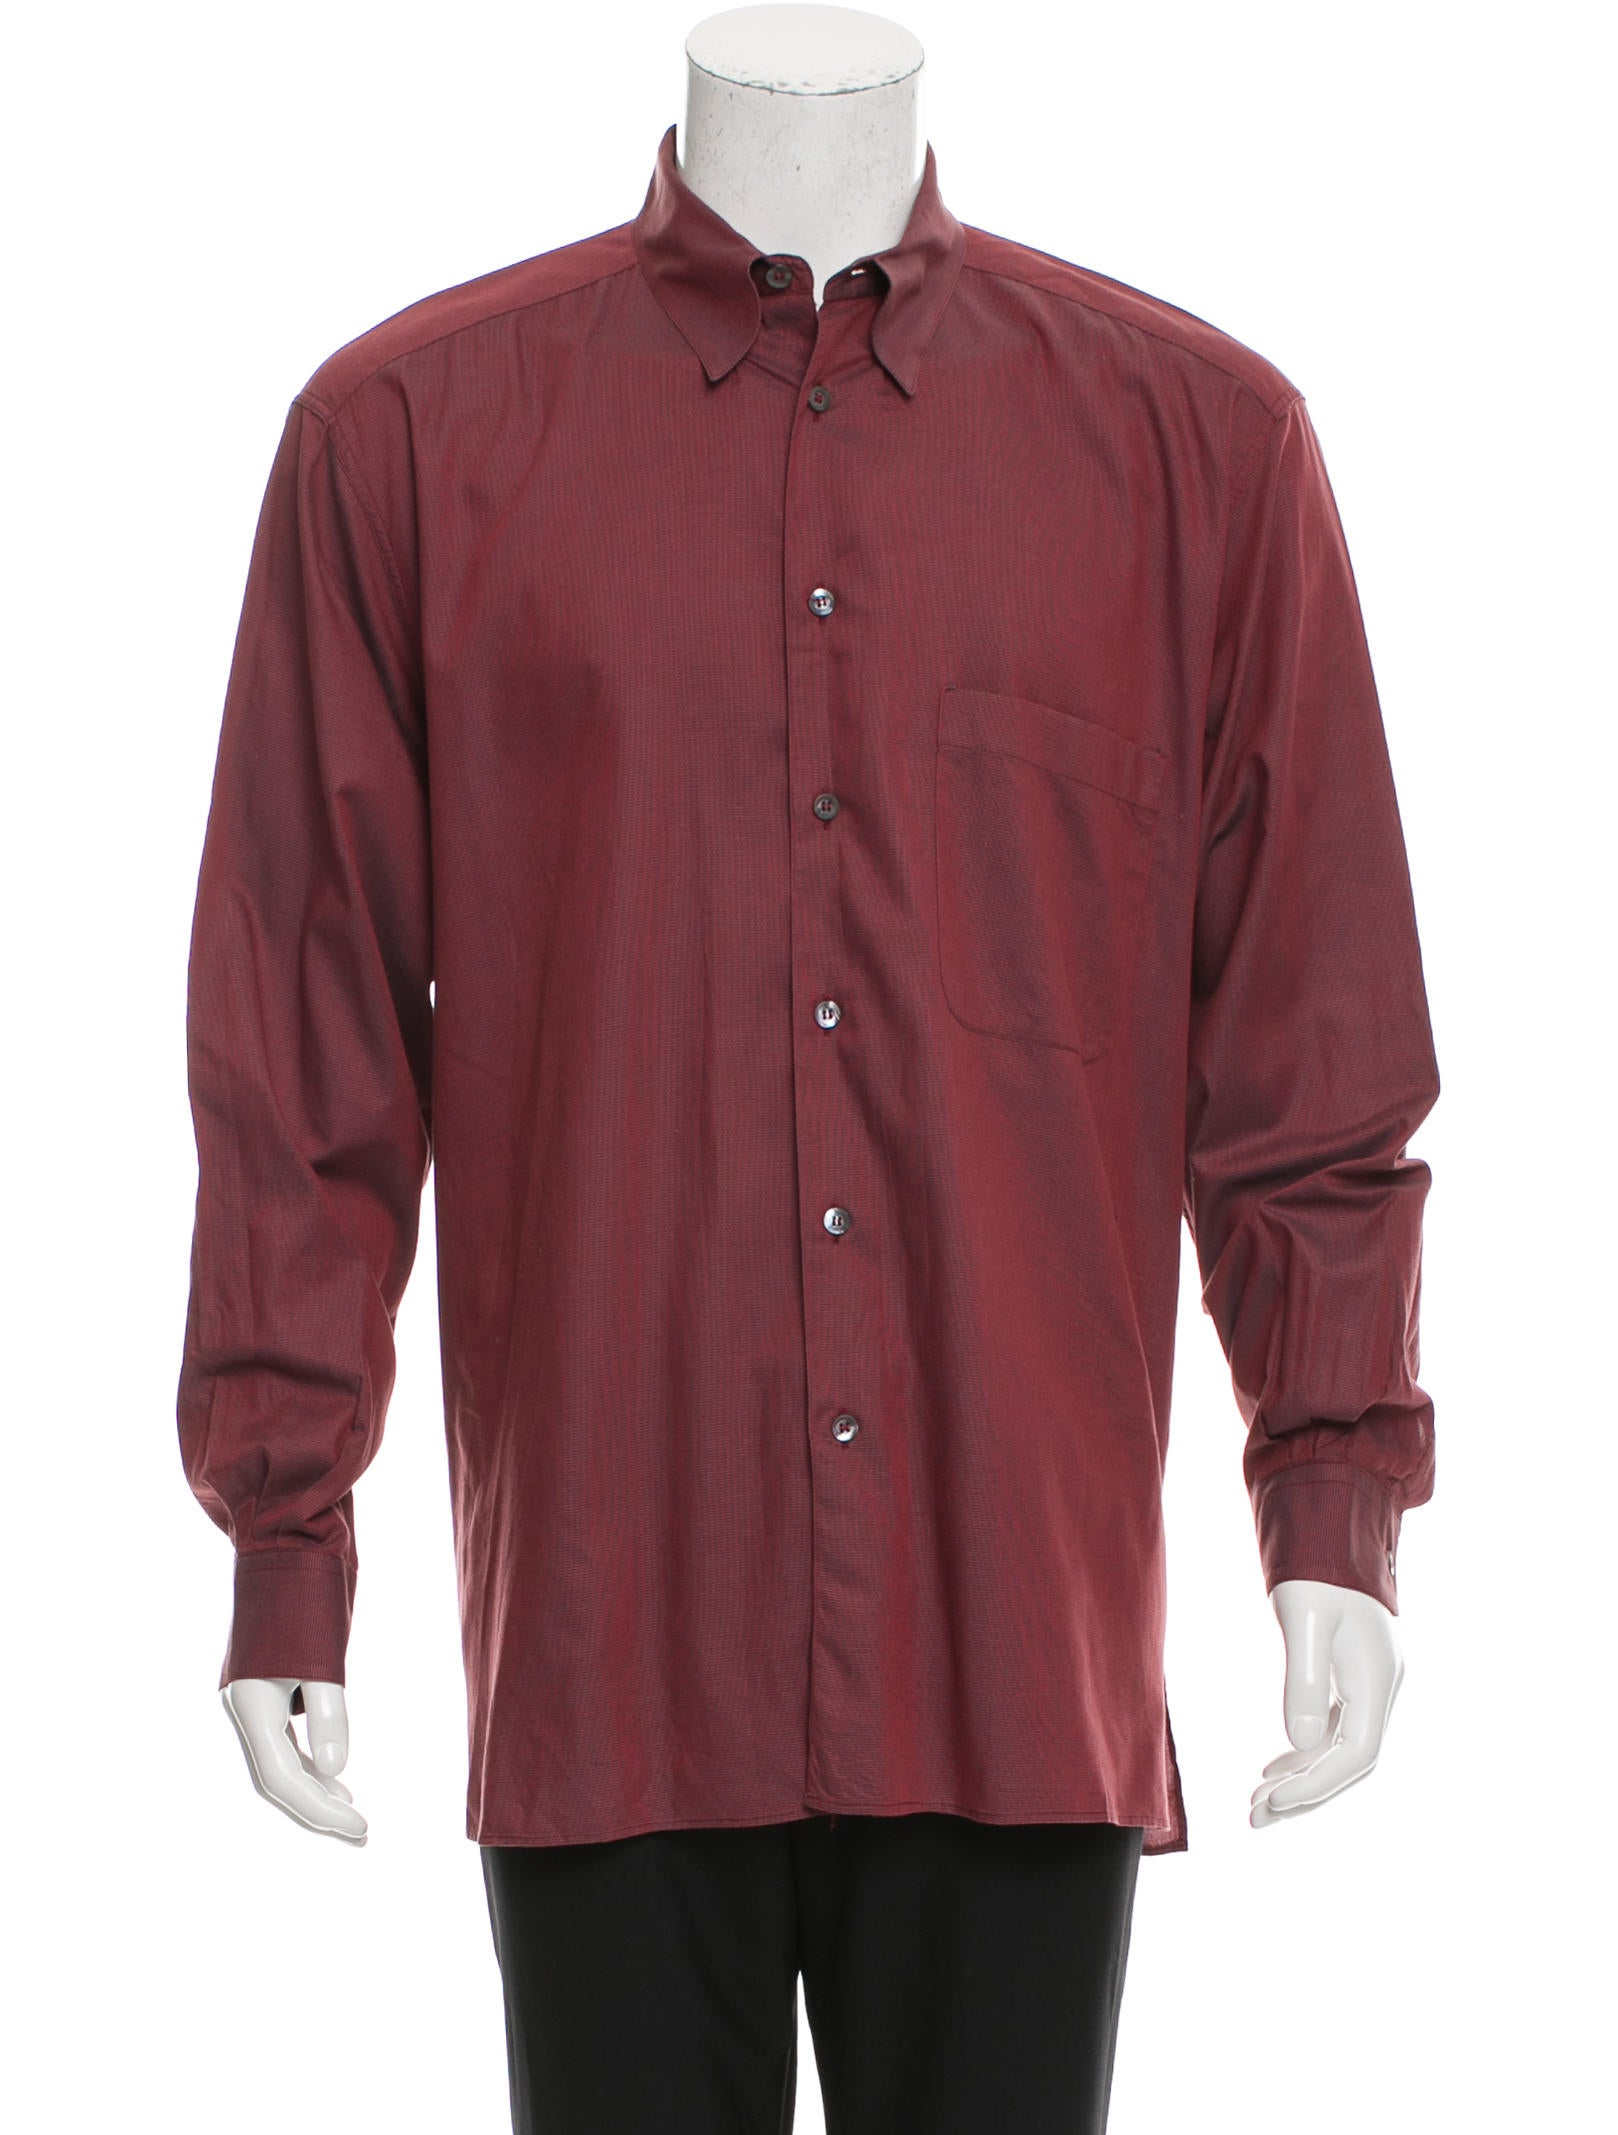 ermenegildo zegna patterned button up shirt clothing zgn24642 the realreal. Black Bedroom Furniture Sets. Home Design Ideas